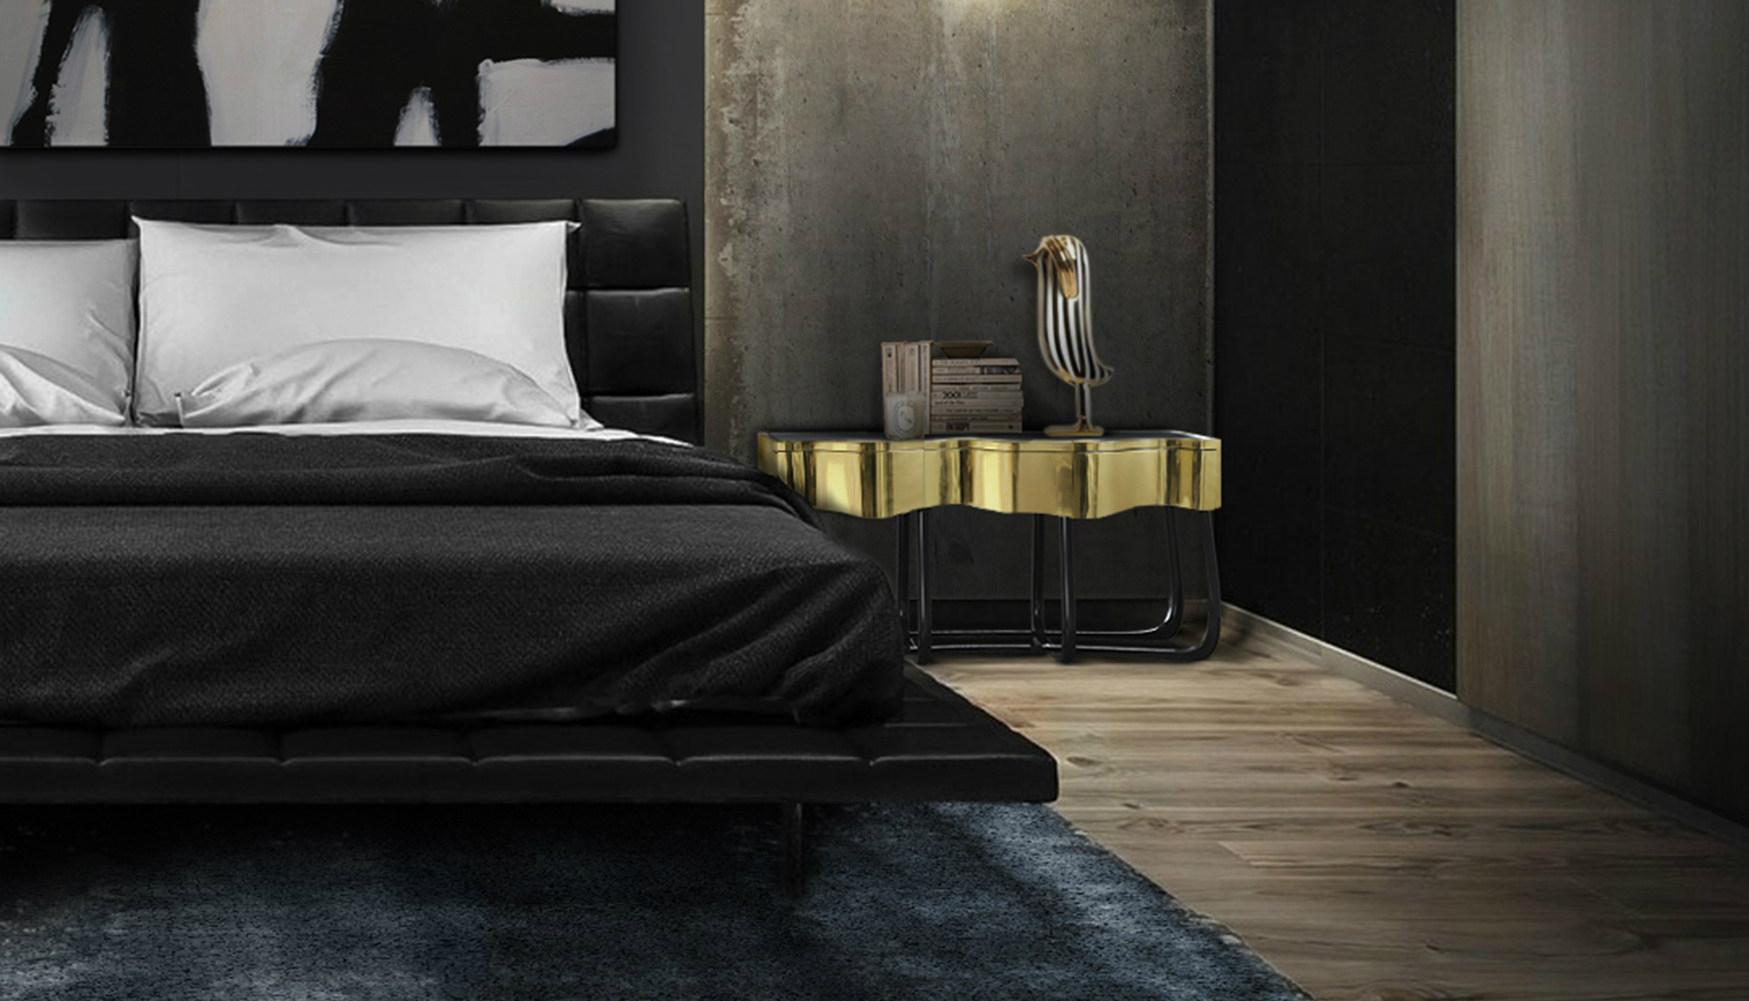 IMM Cologne 2018 Ideas de Diseño de Interiores para Tomar de IMM Cologne 2018 SINUOUS Nightstand Boca do Lobo 221322 reldeec8c61